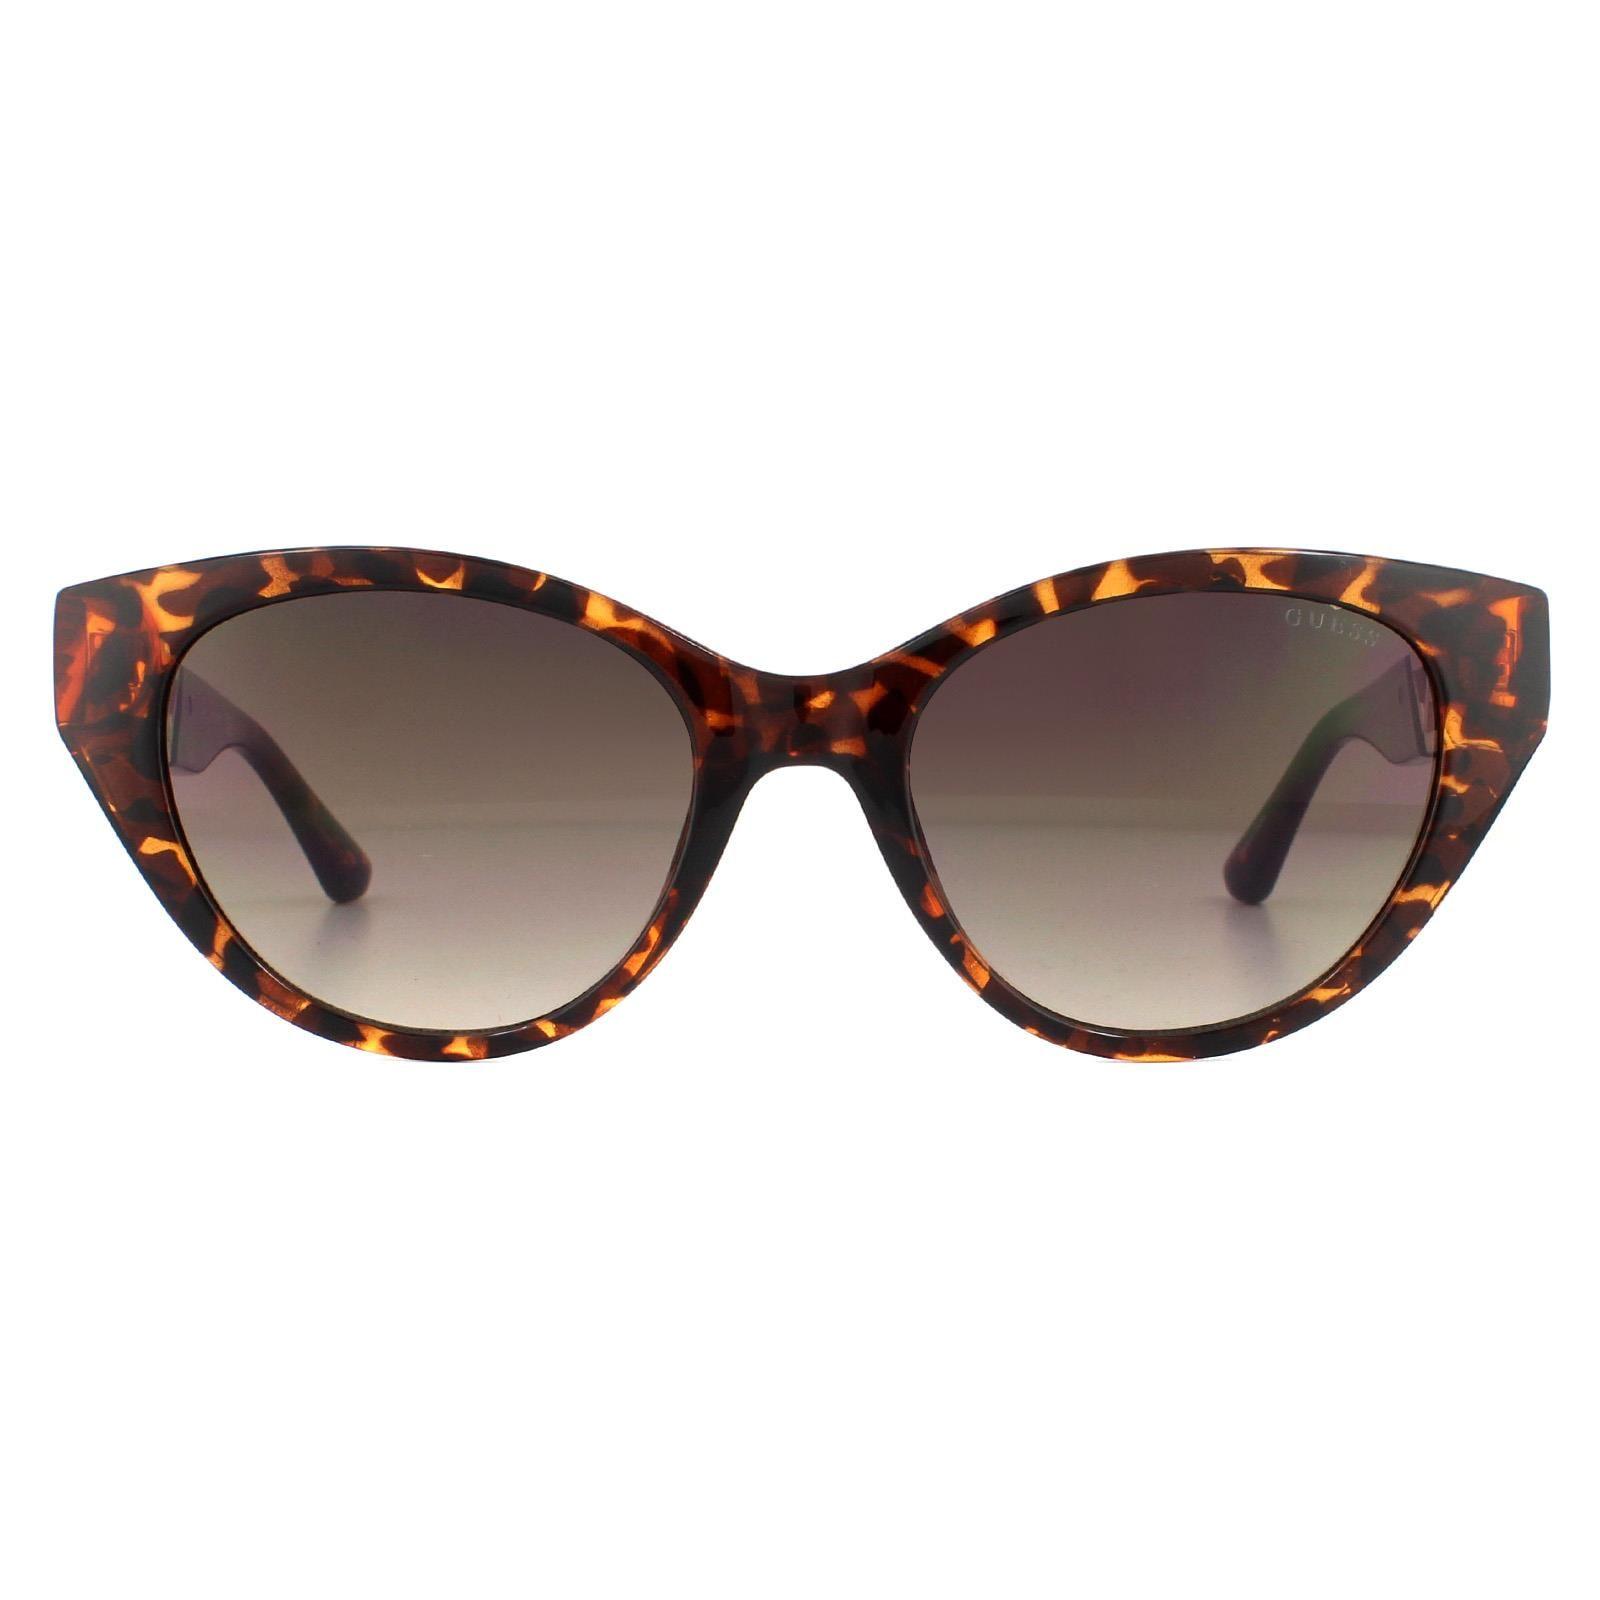 Guess Sunglasses GU7690 52F Dark Havana Brown Gradient